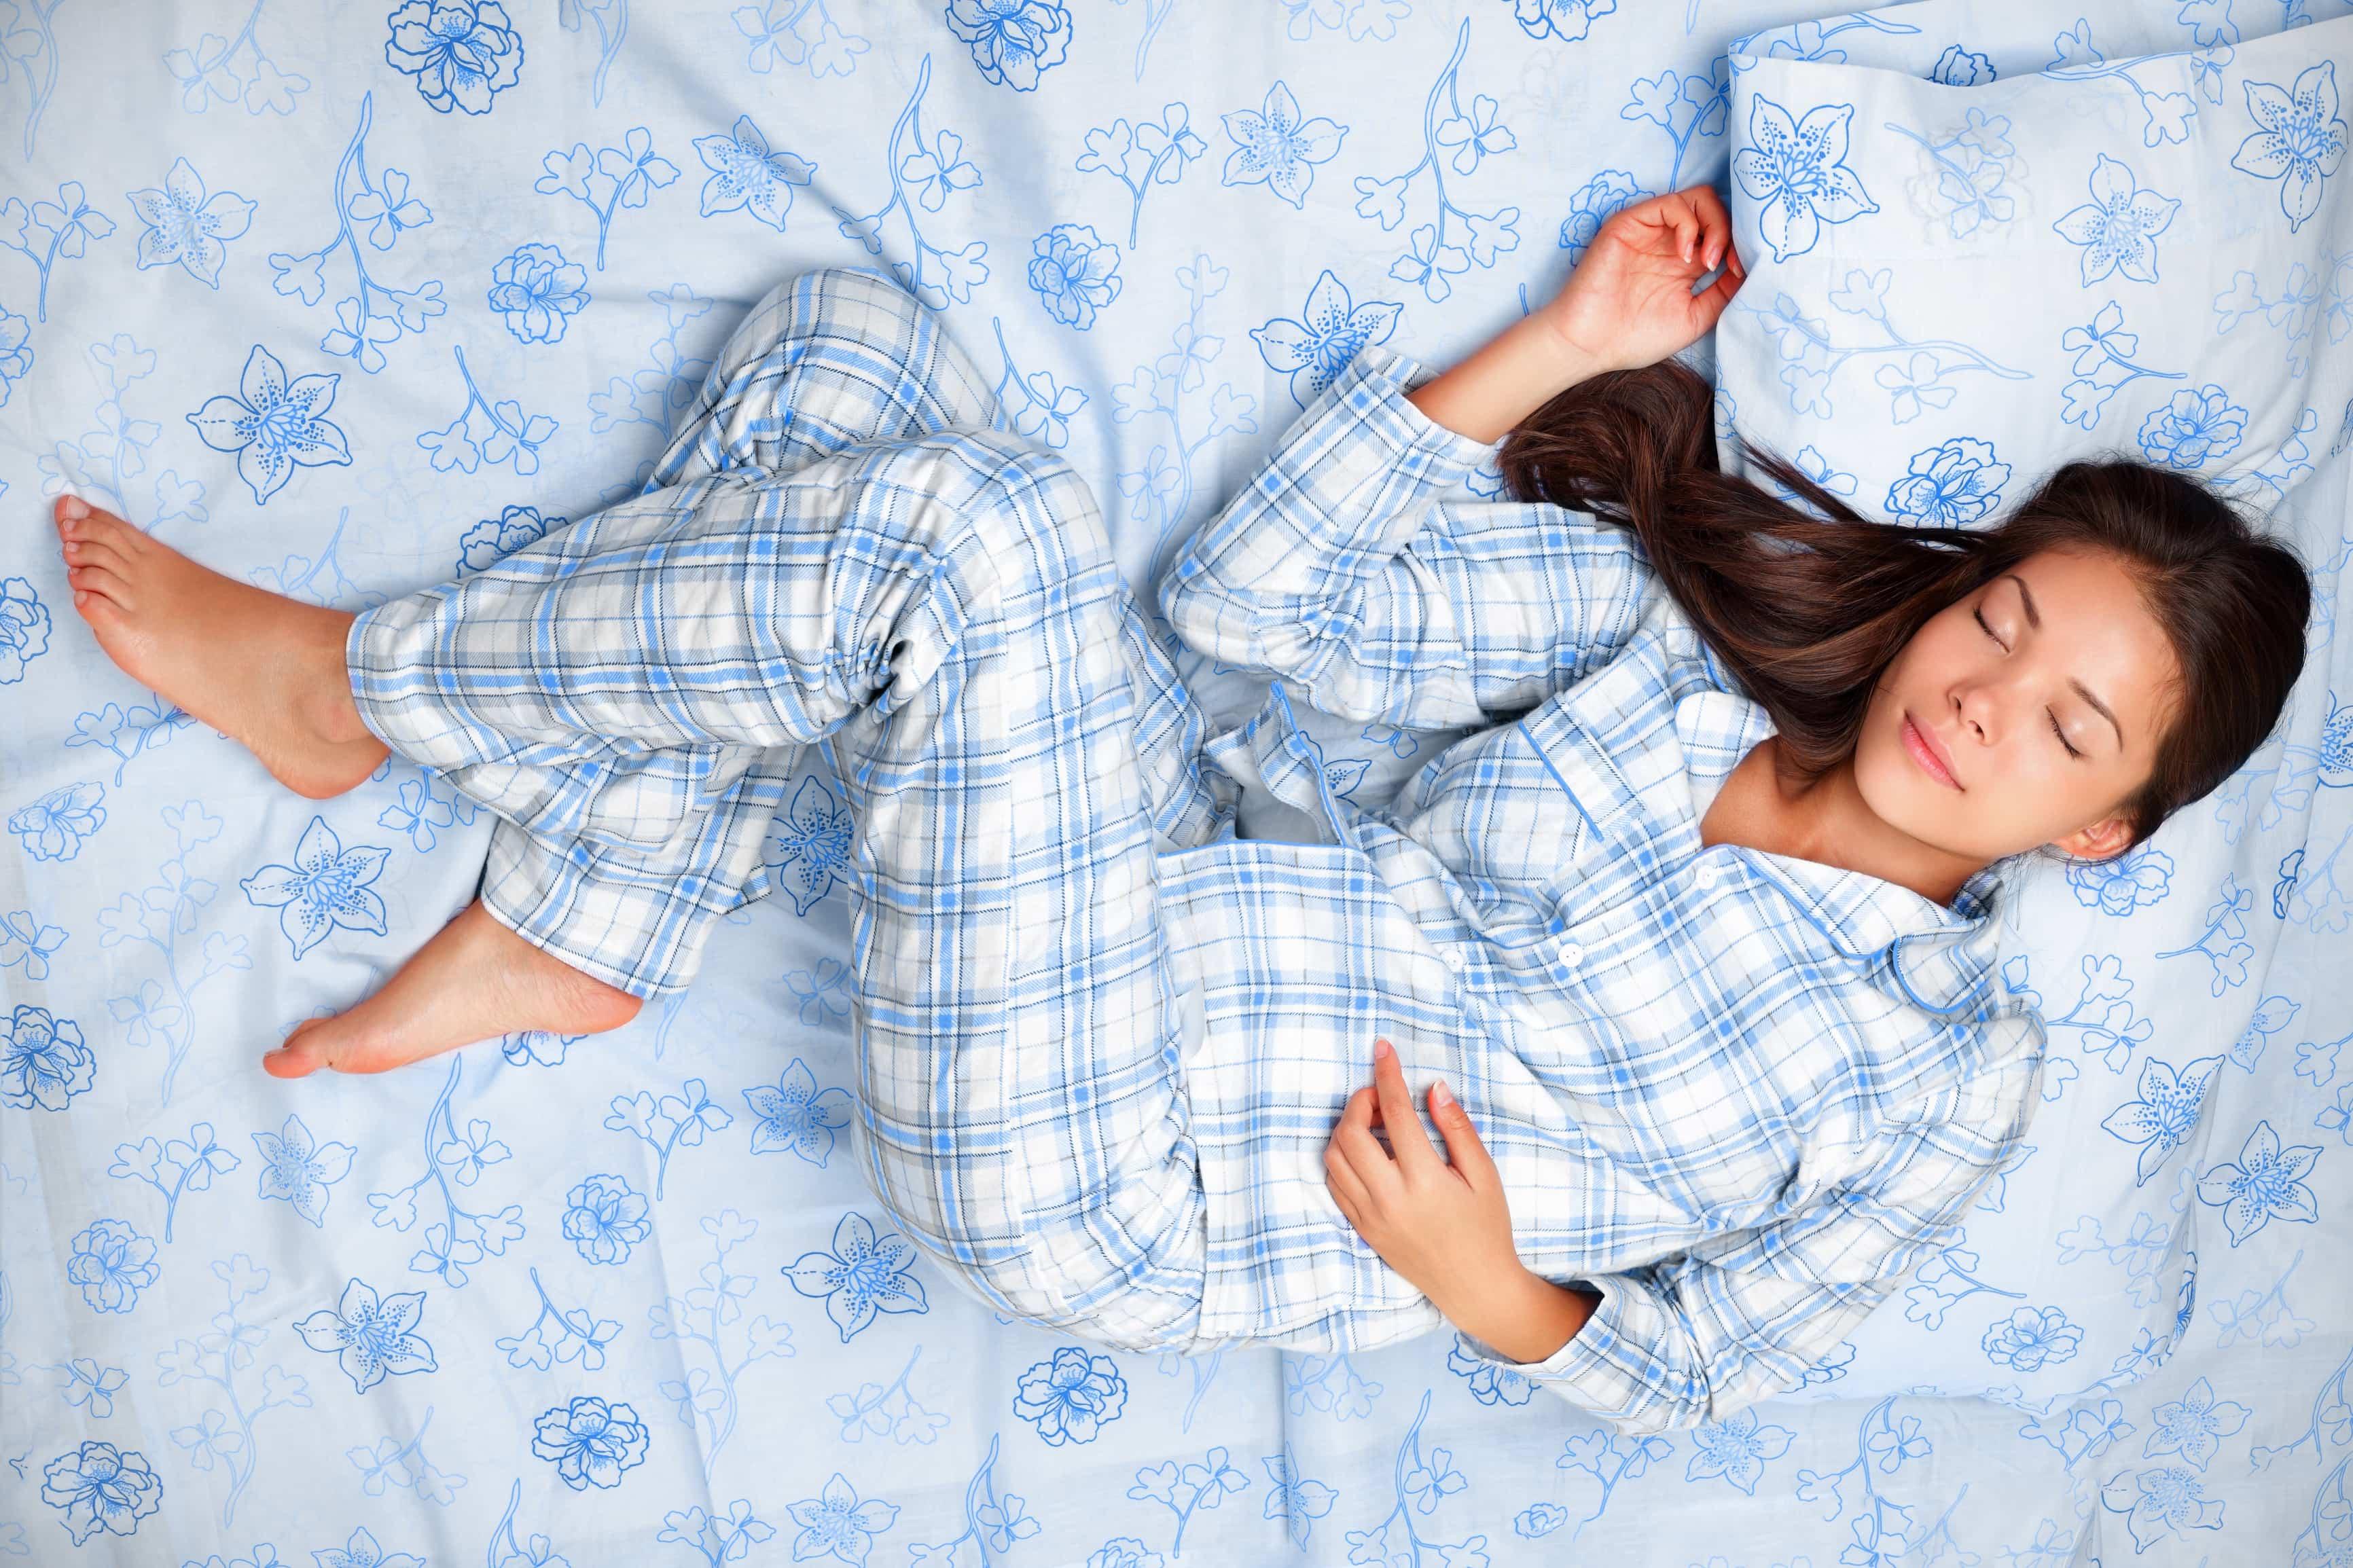 técnicas para dormir rápido